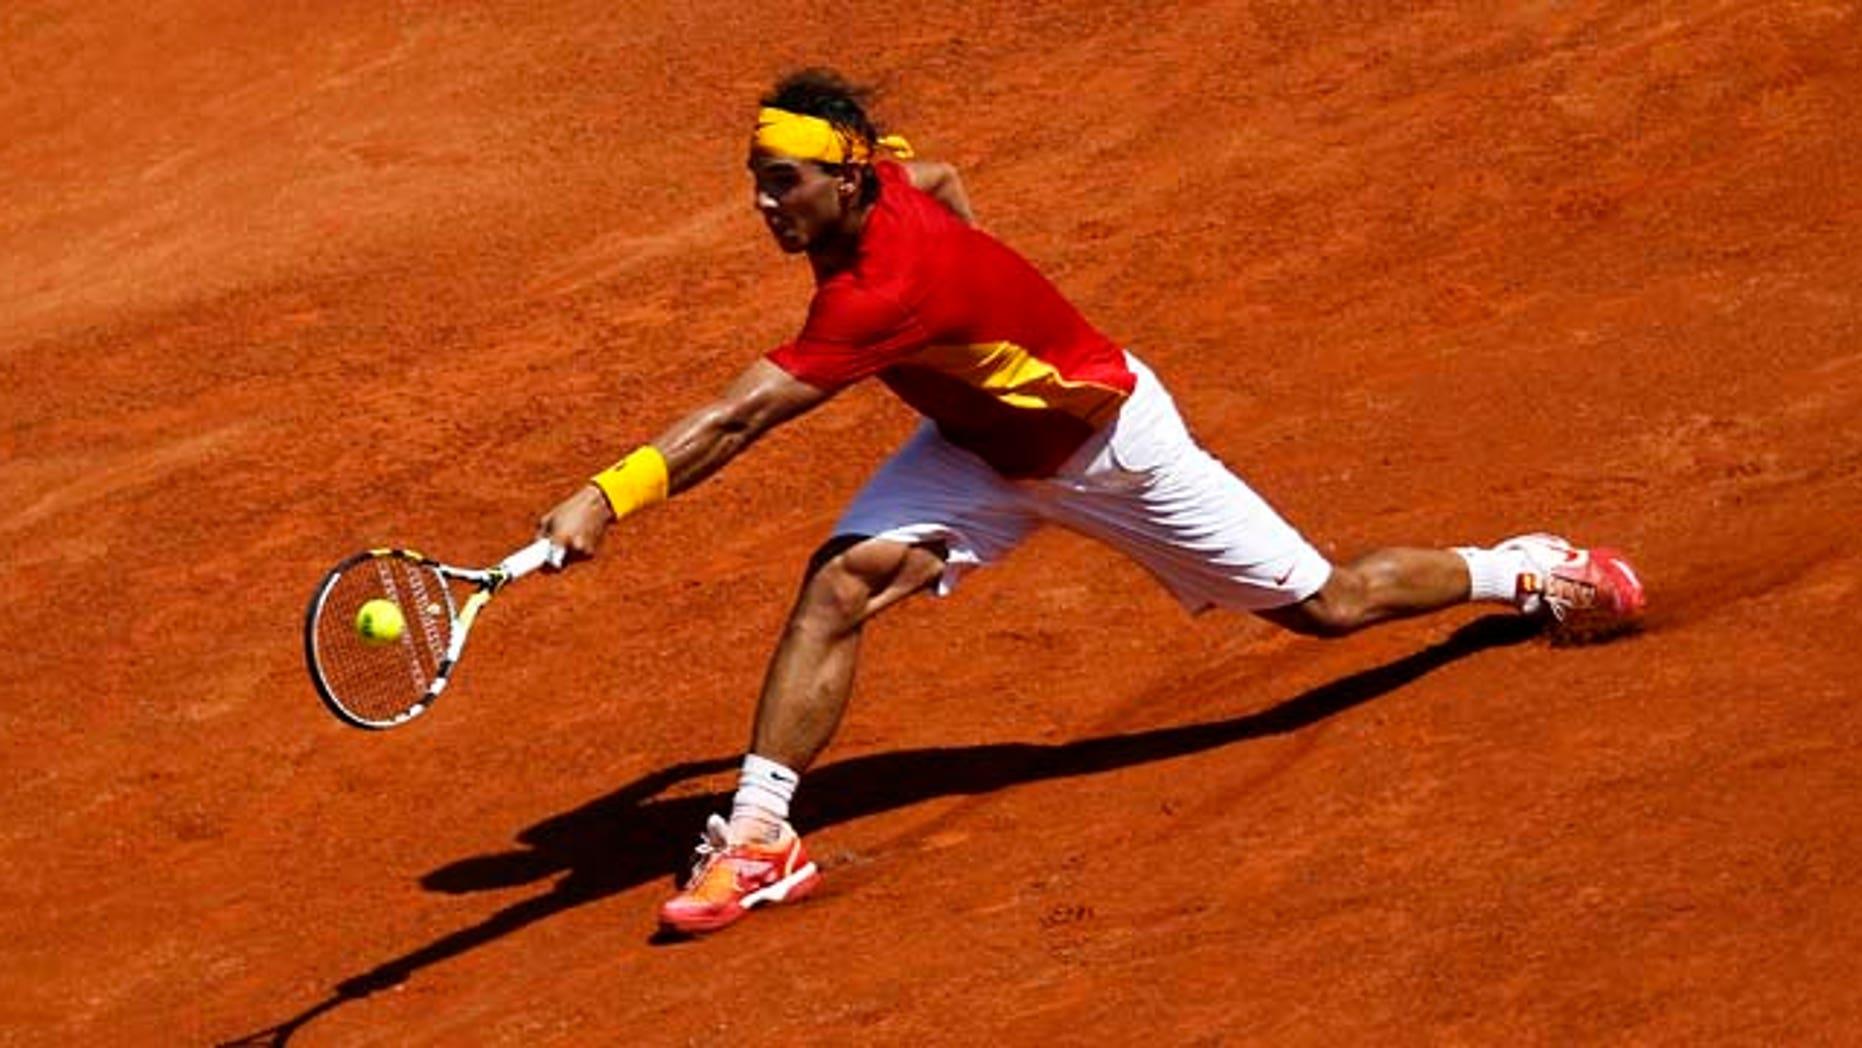 Spain's Rafael Nadal plays a shot during a Davis Cup semi-final tennis match against France's Richard Gasquet in the bullring in Cordoba, Spain, Friday, Sep. 16, 2011. (AP Photo/Sergio Torres)